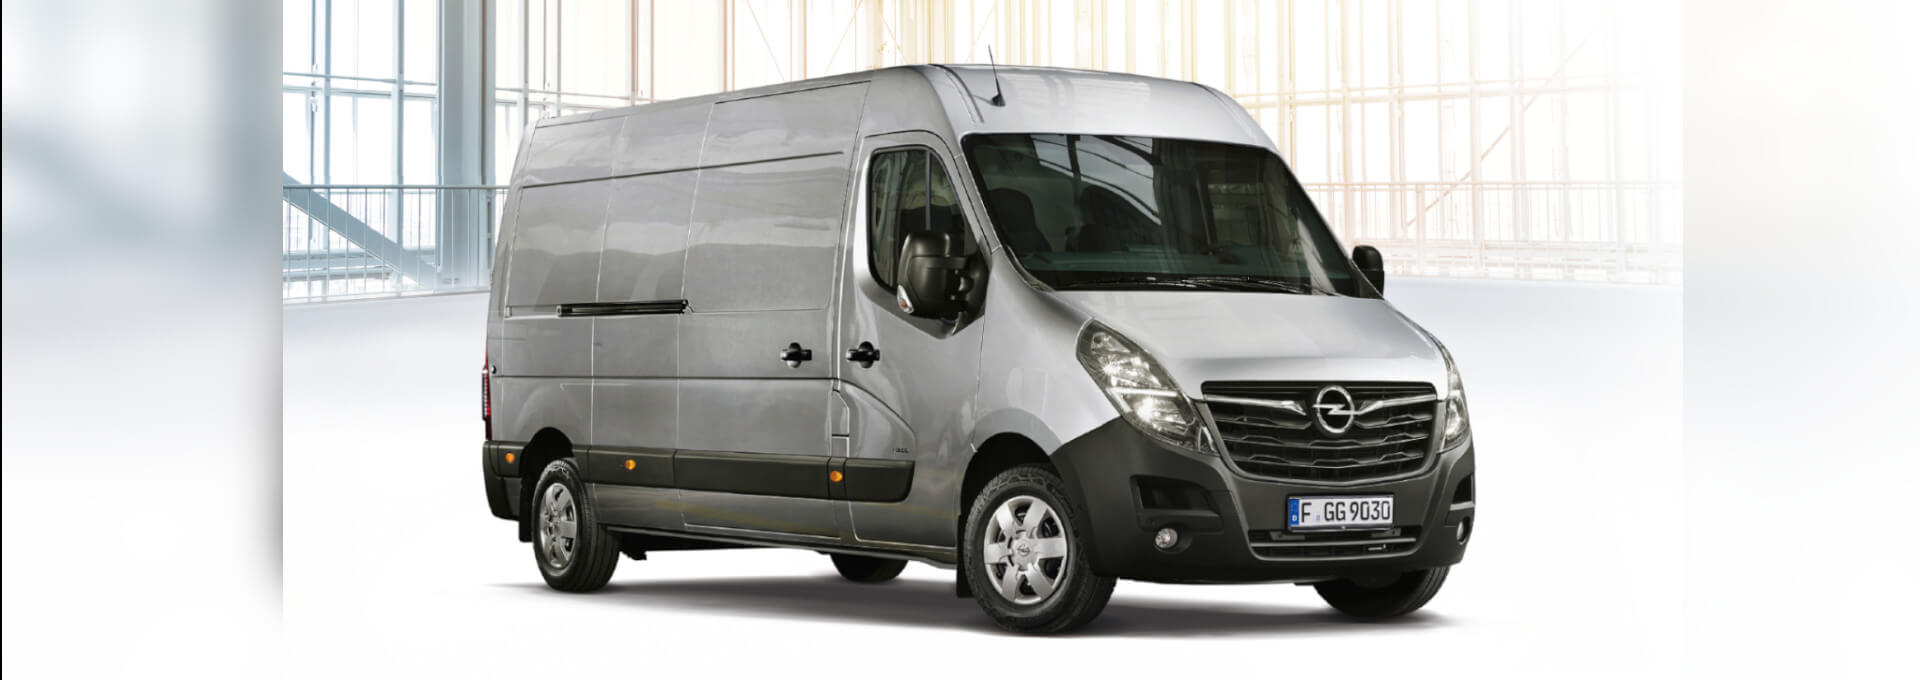 Opel Movano Kastenwagen in Industriehalle